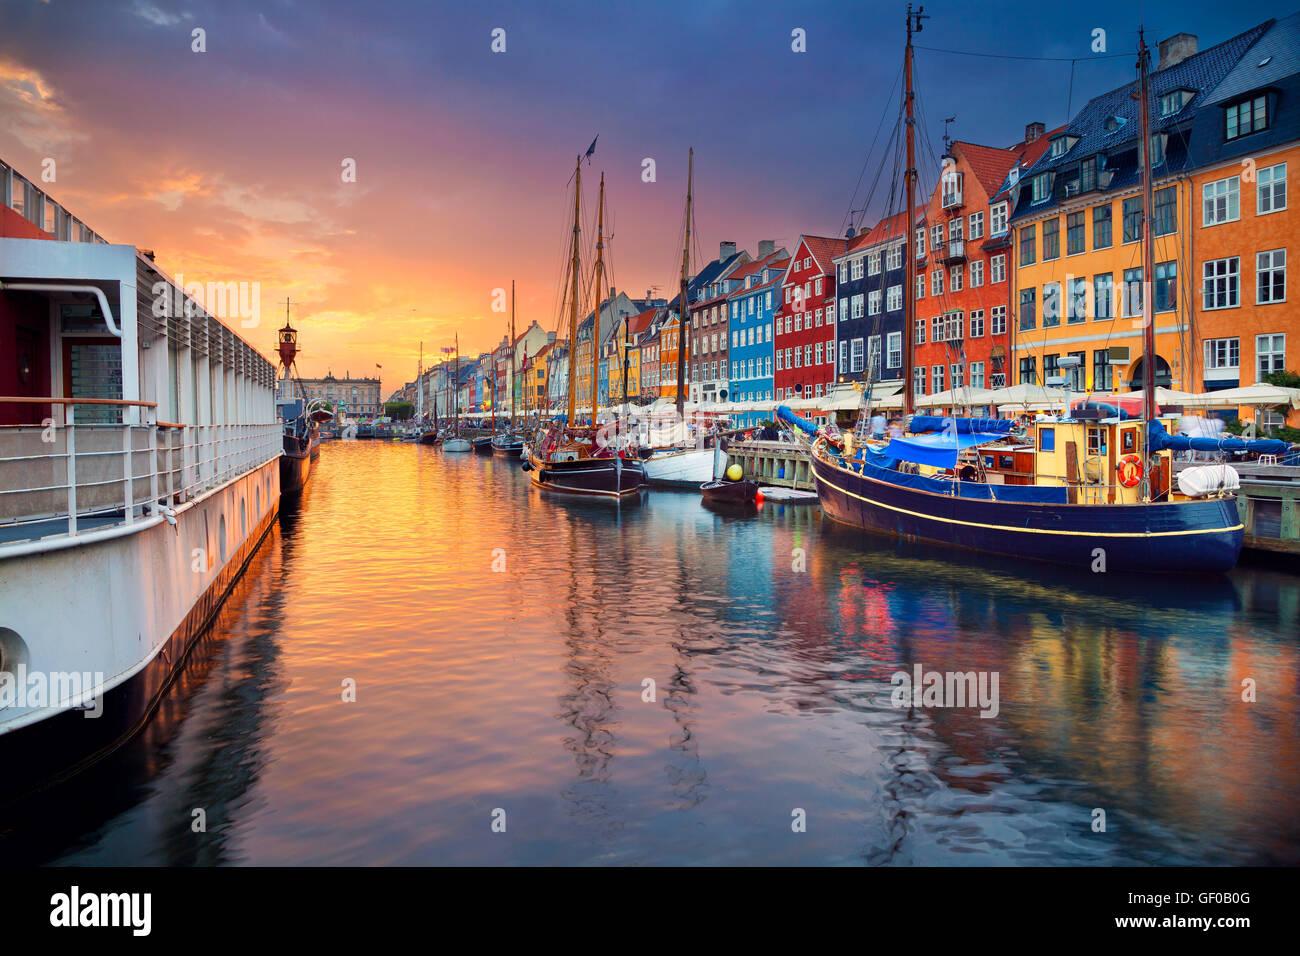 Copenhagen, Nyhavn Canal. Image of Nyhavn Canal in Copenhagen, Denmark during beautiful sunset. - Stock Image